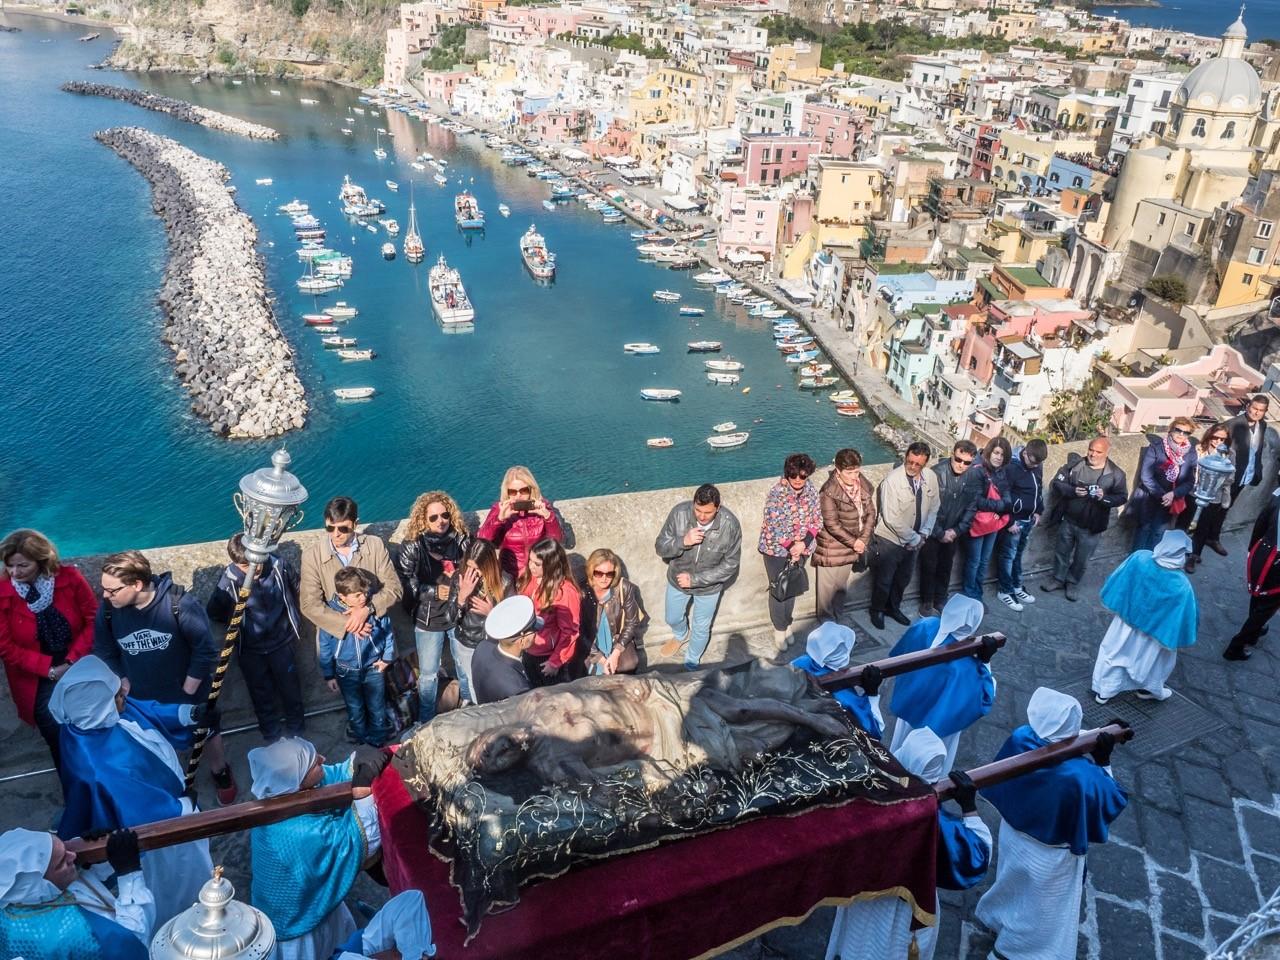 Insel Ischia, Italien, Mittelmeer, Prozession, Rotel Tours